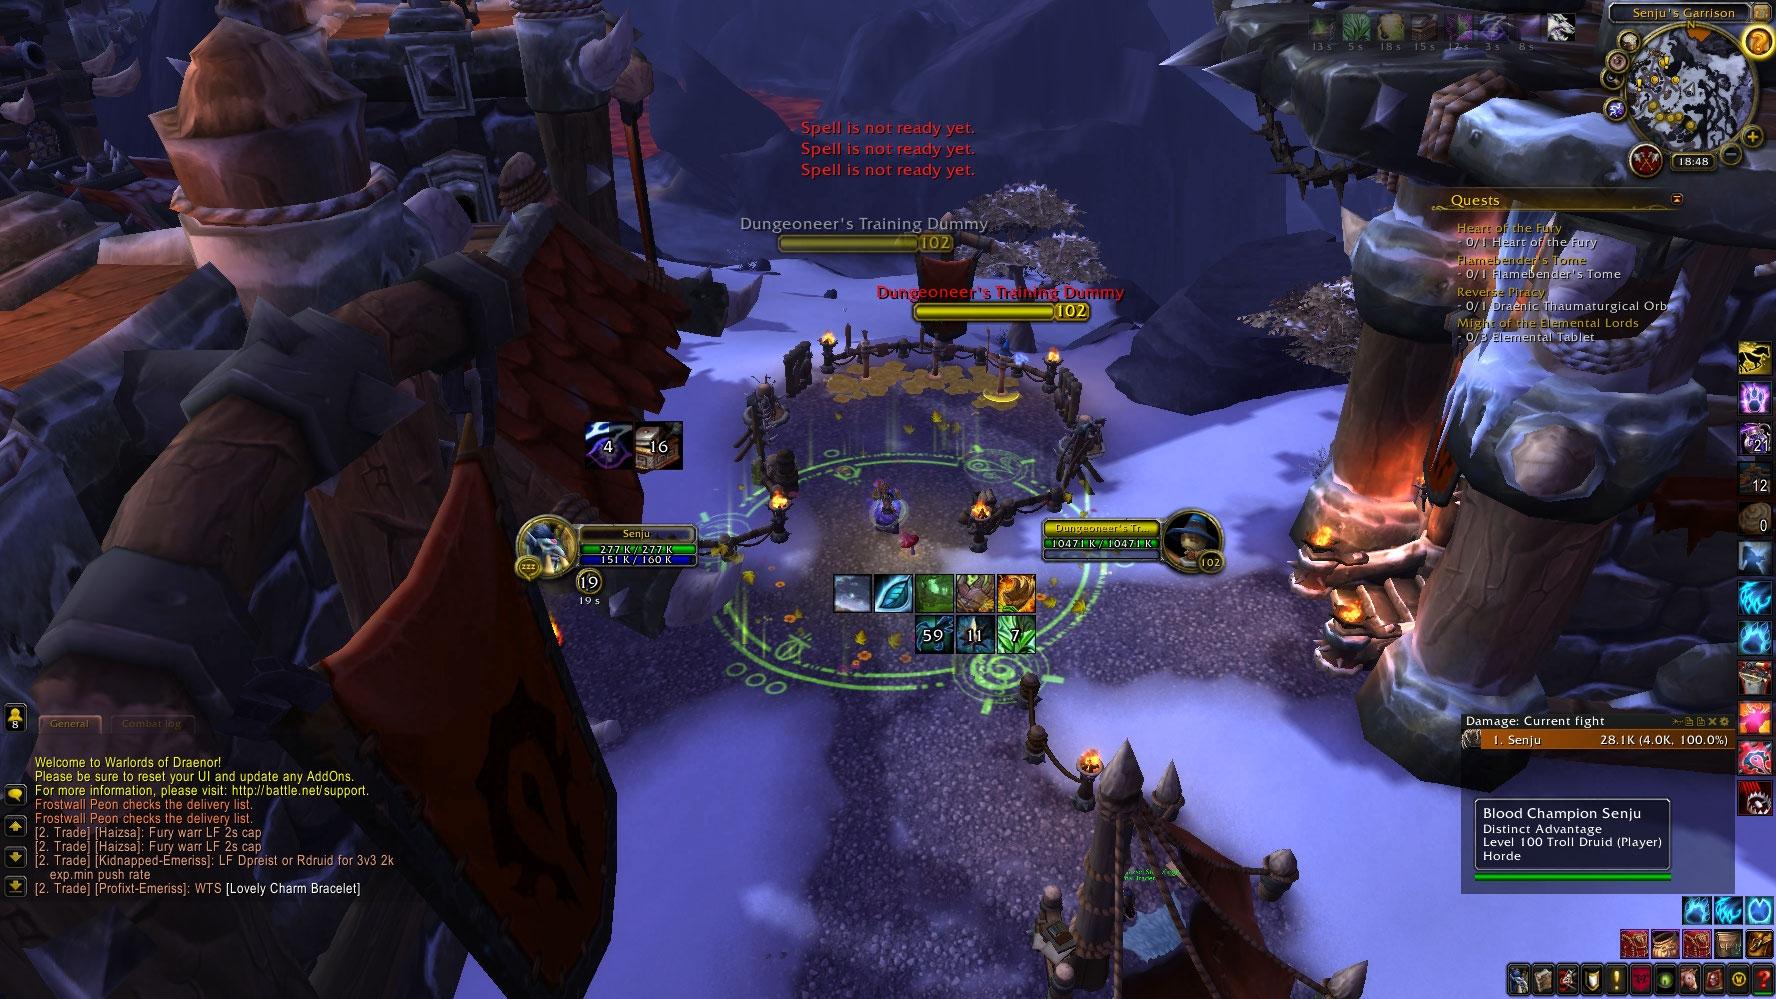 Tvattnisse's Druid UI : Healer Compilations : World of